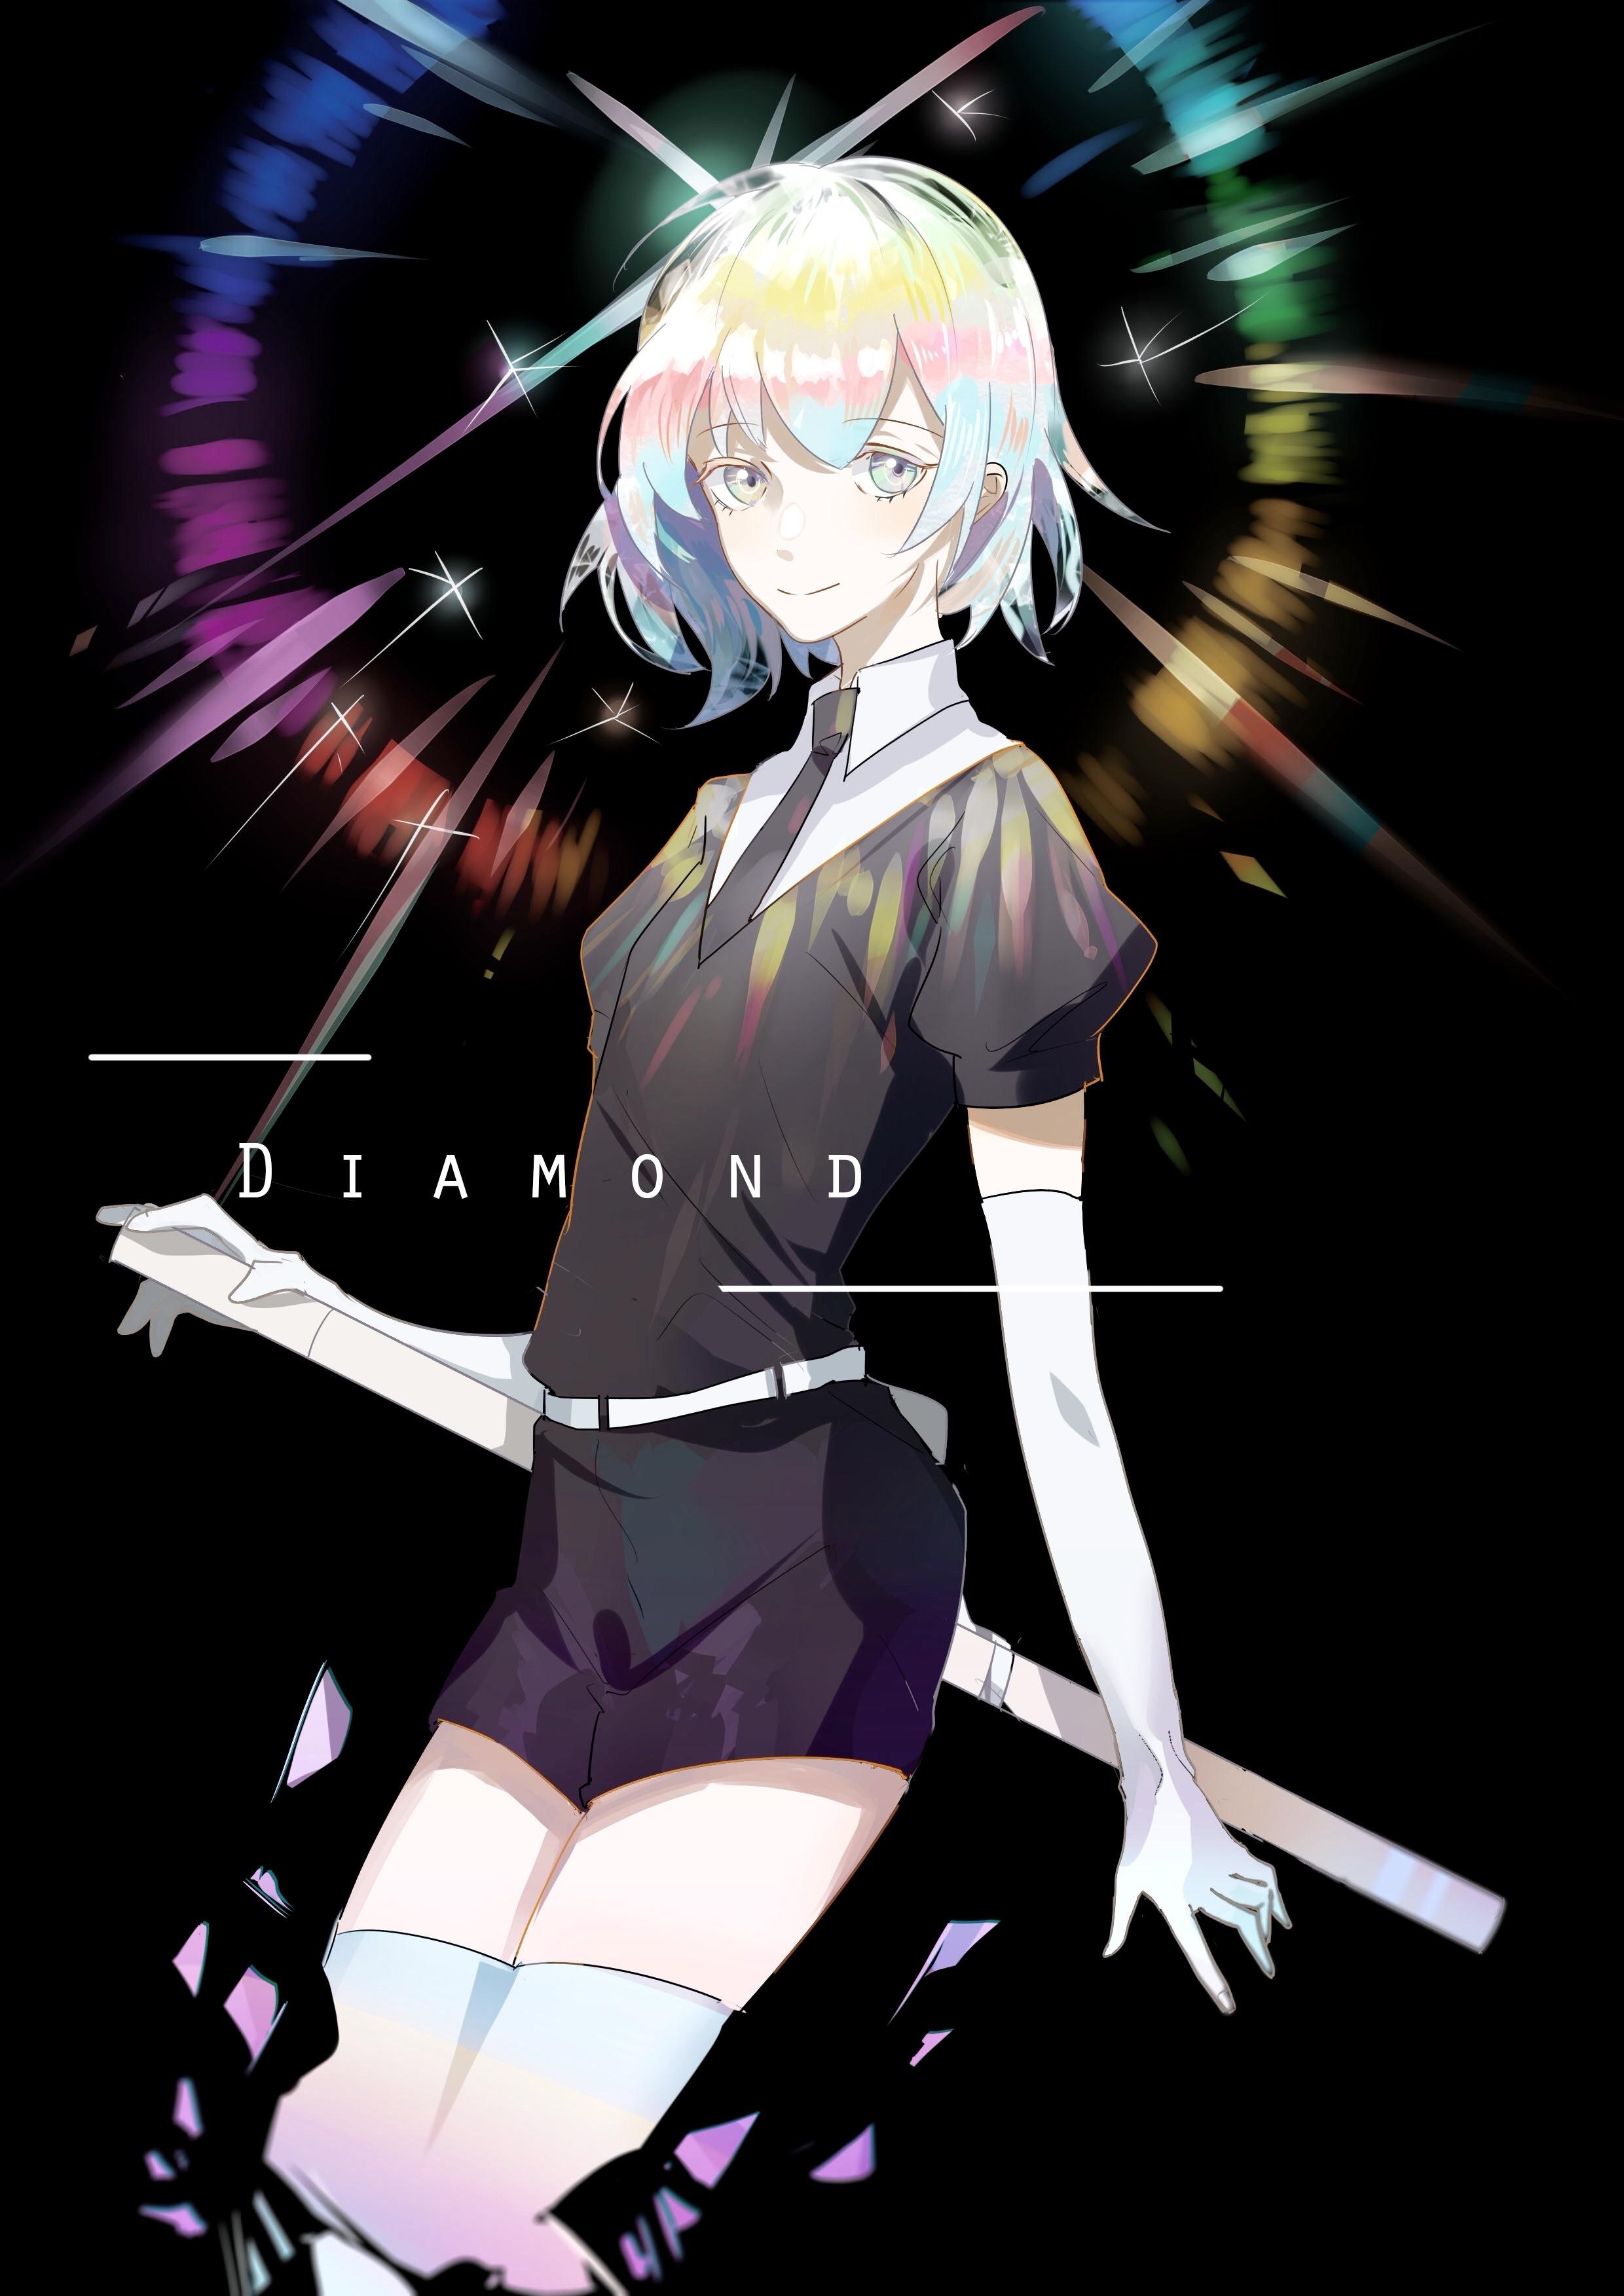 Land of the lustrous diamond - 2017 anime wallpaper ...